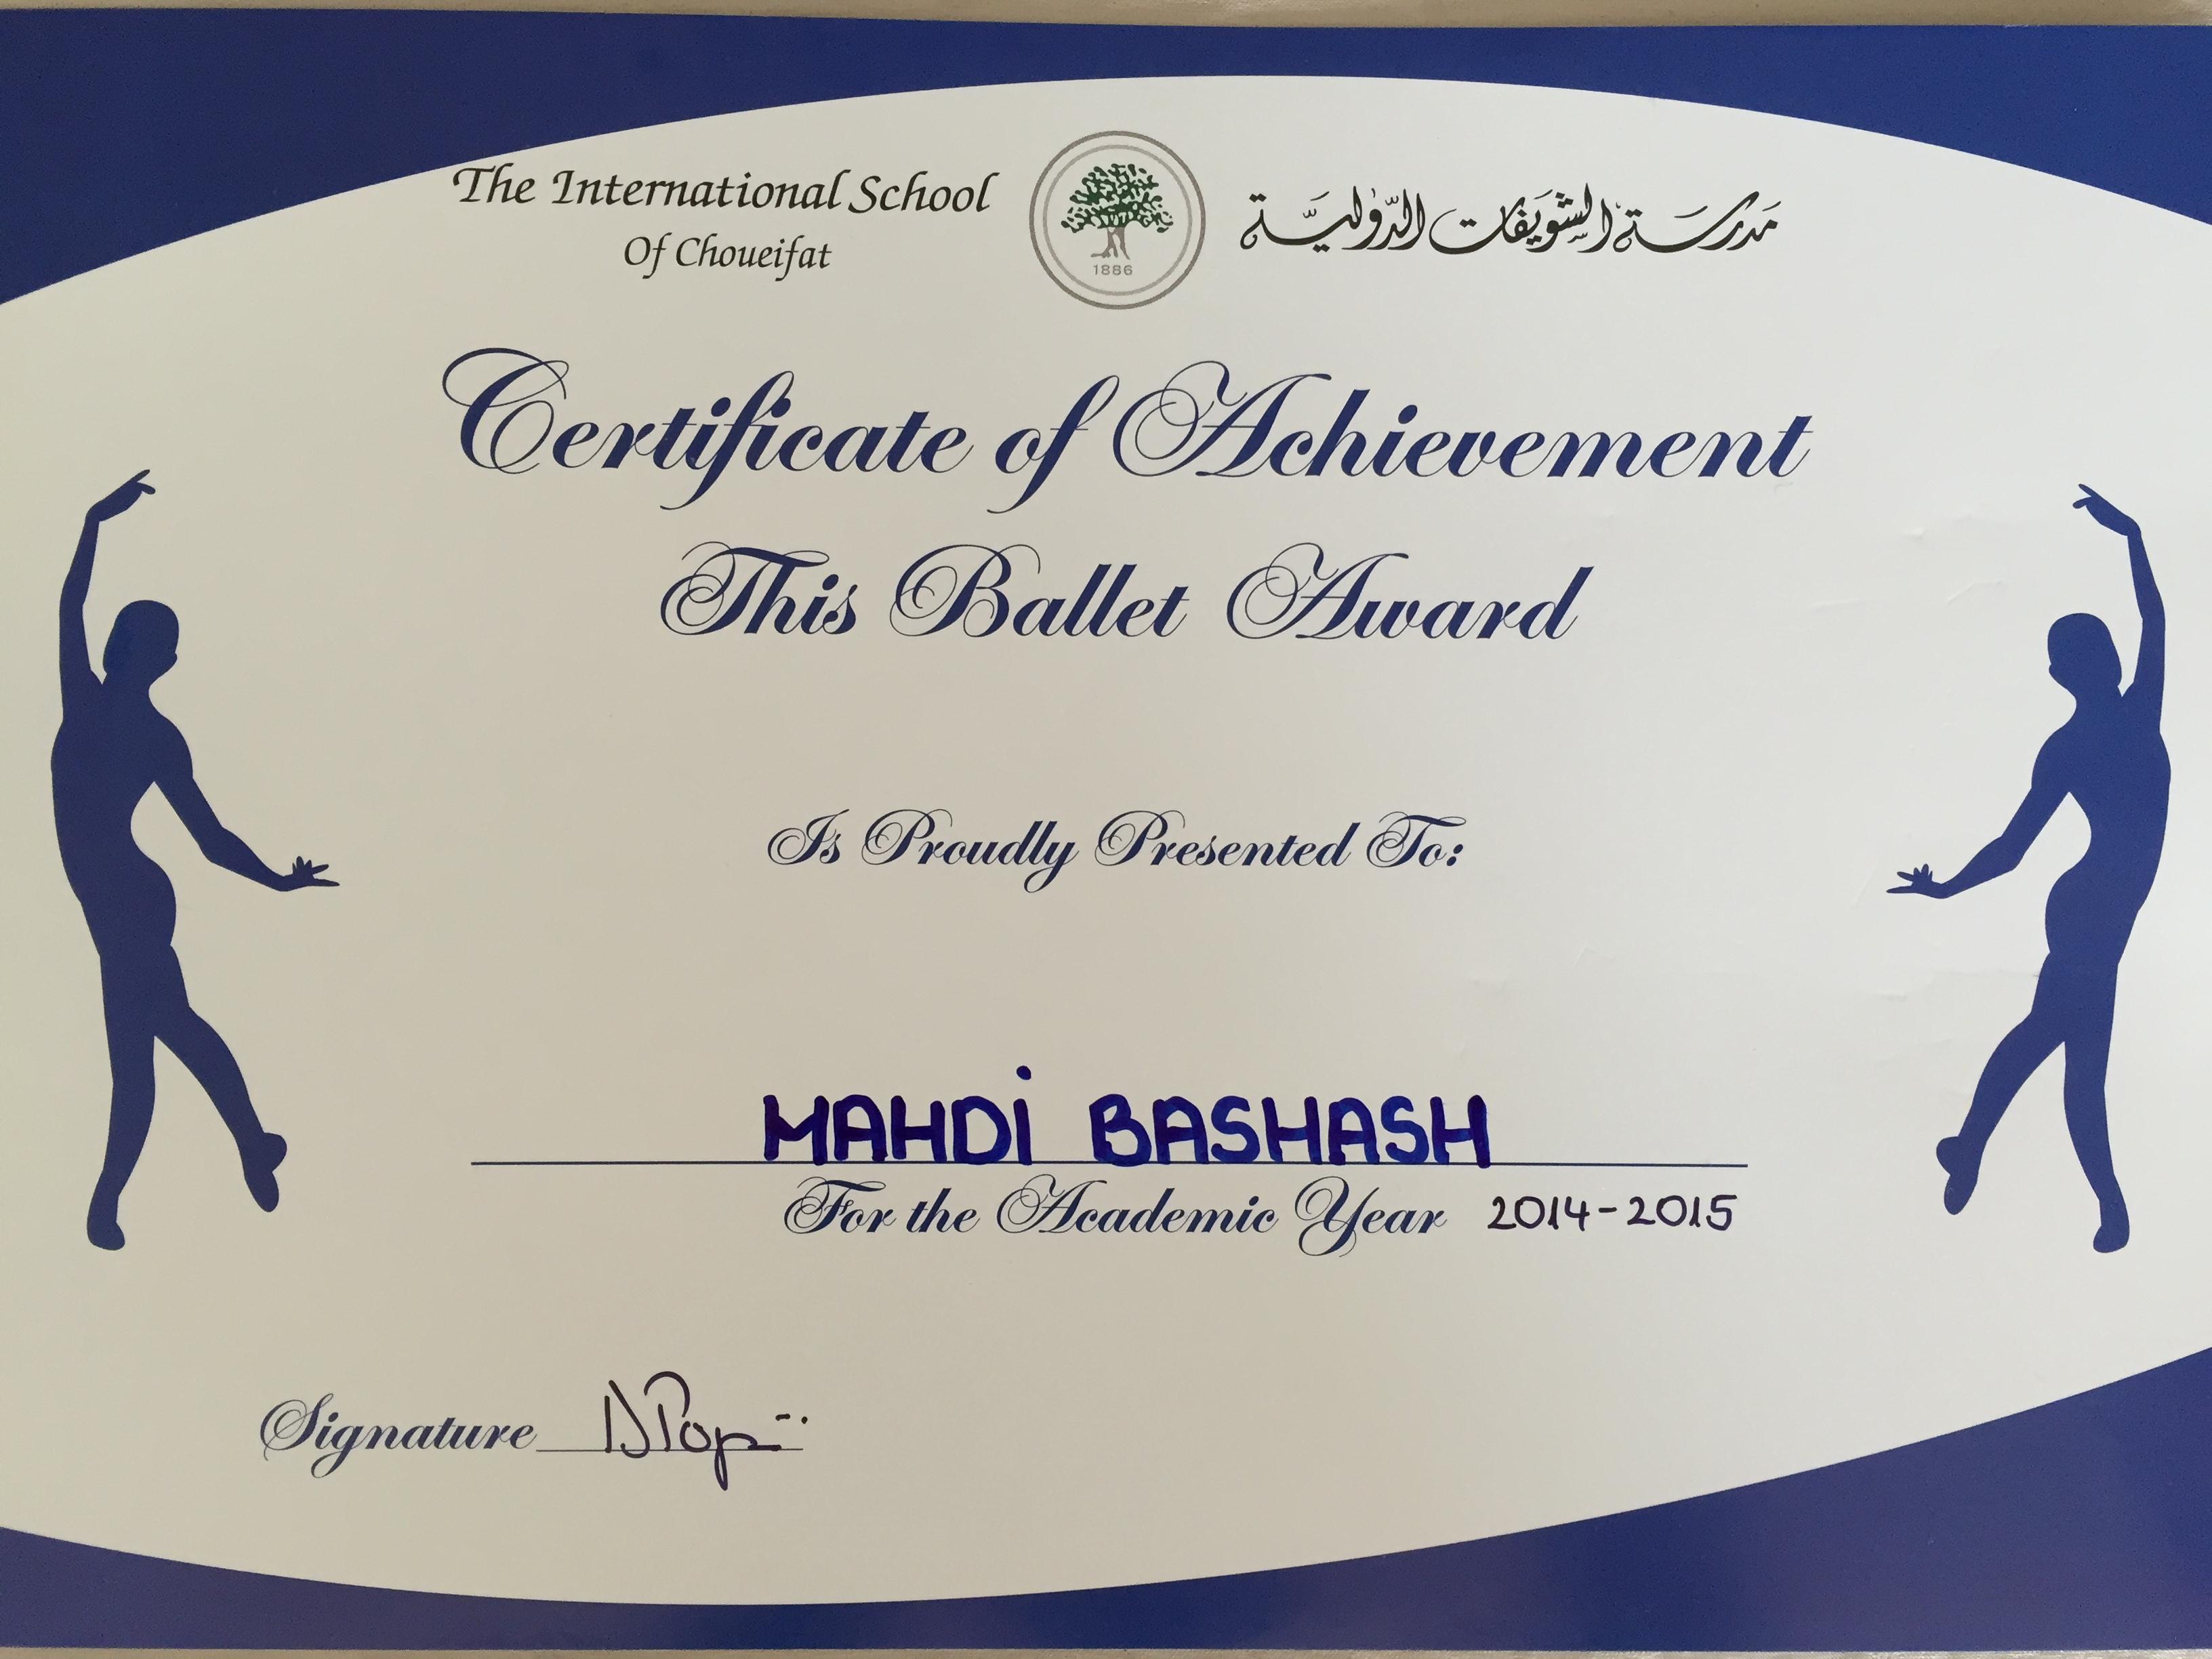 Mahdi Bashash ballet award 2014-2015